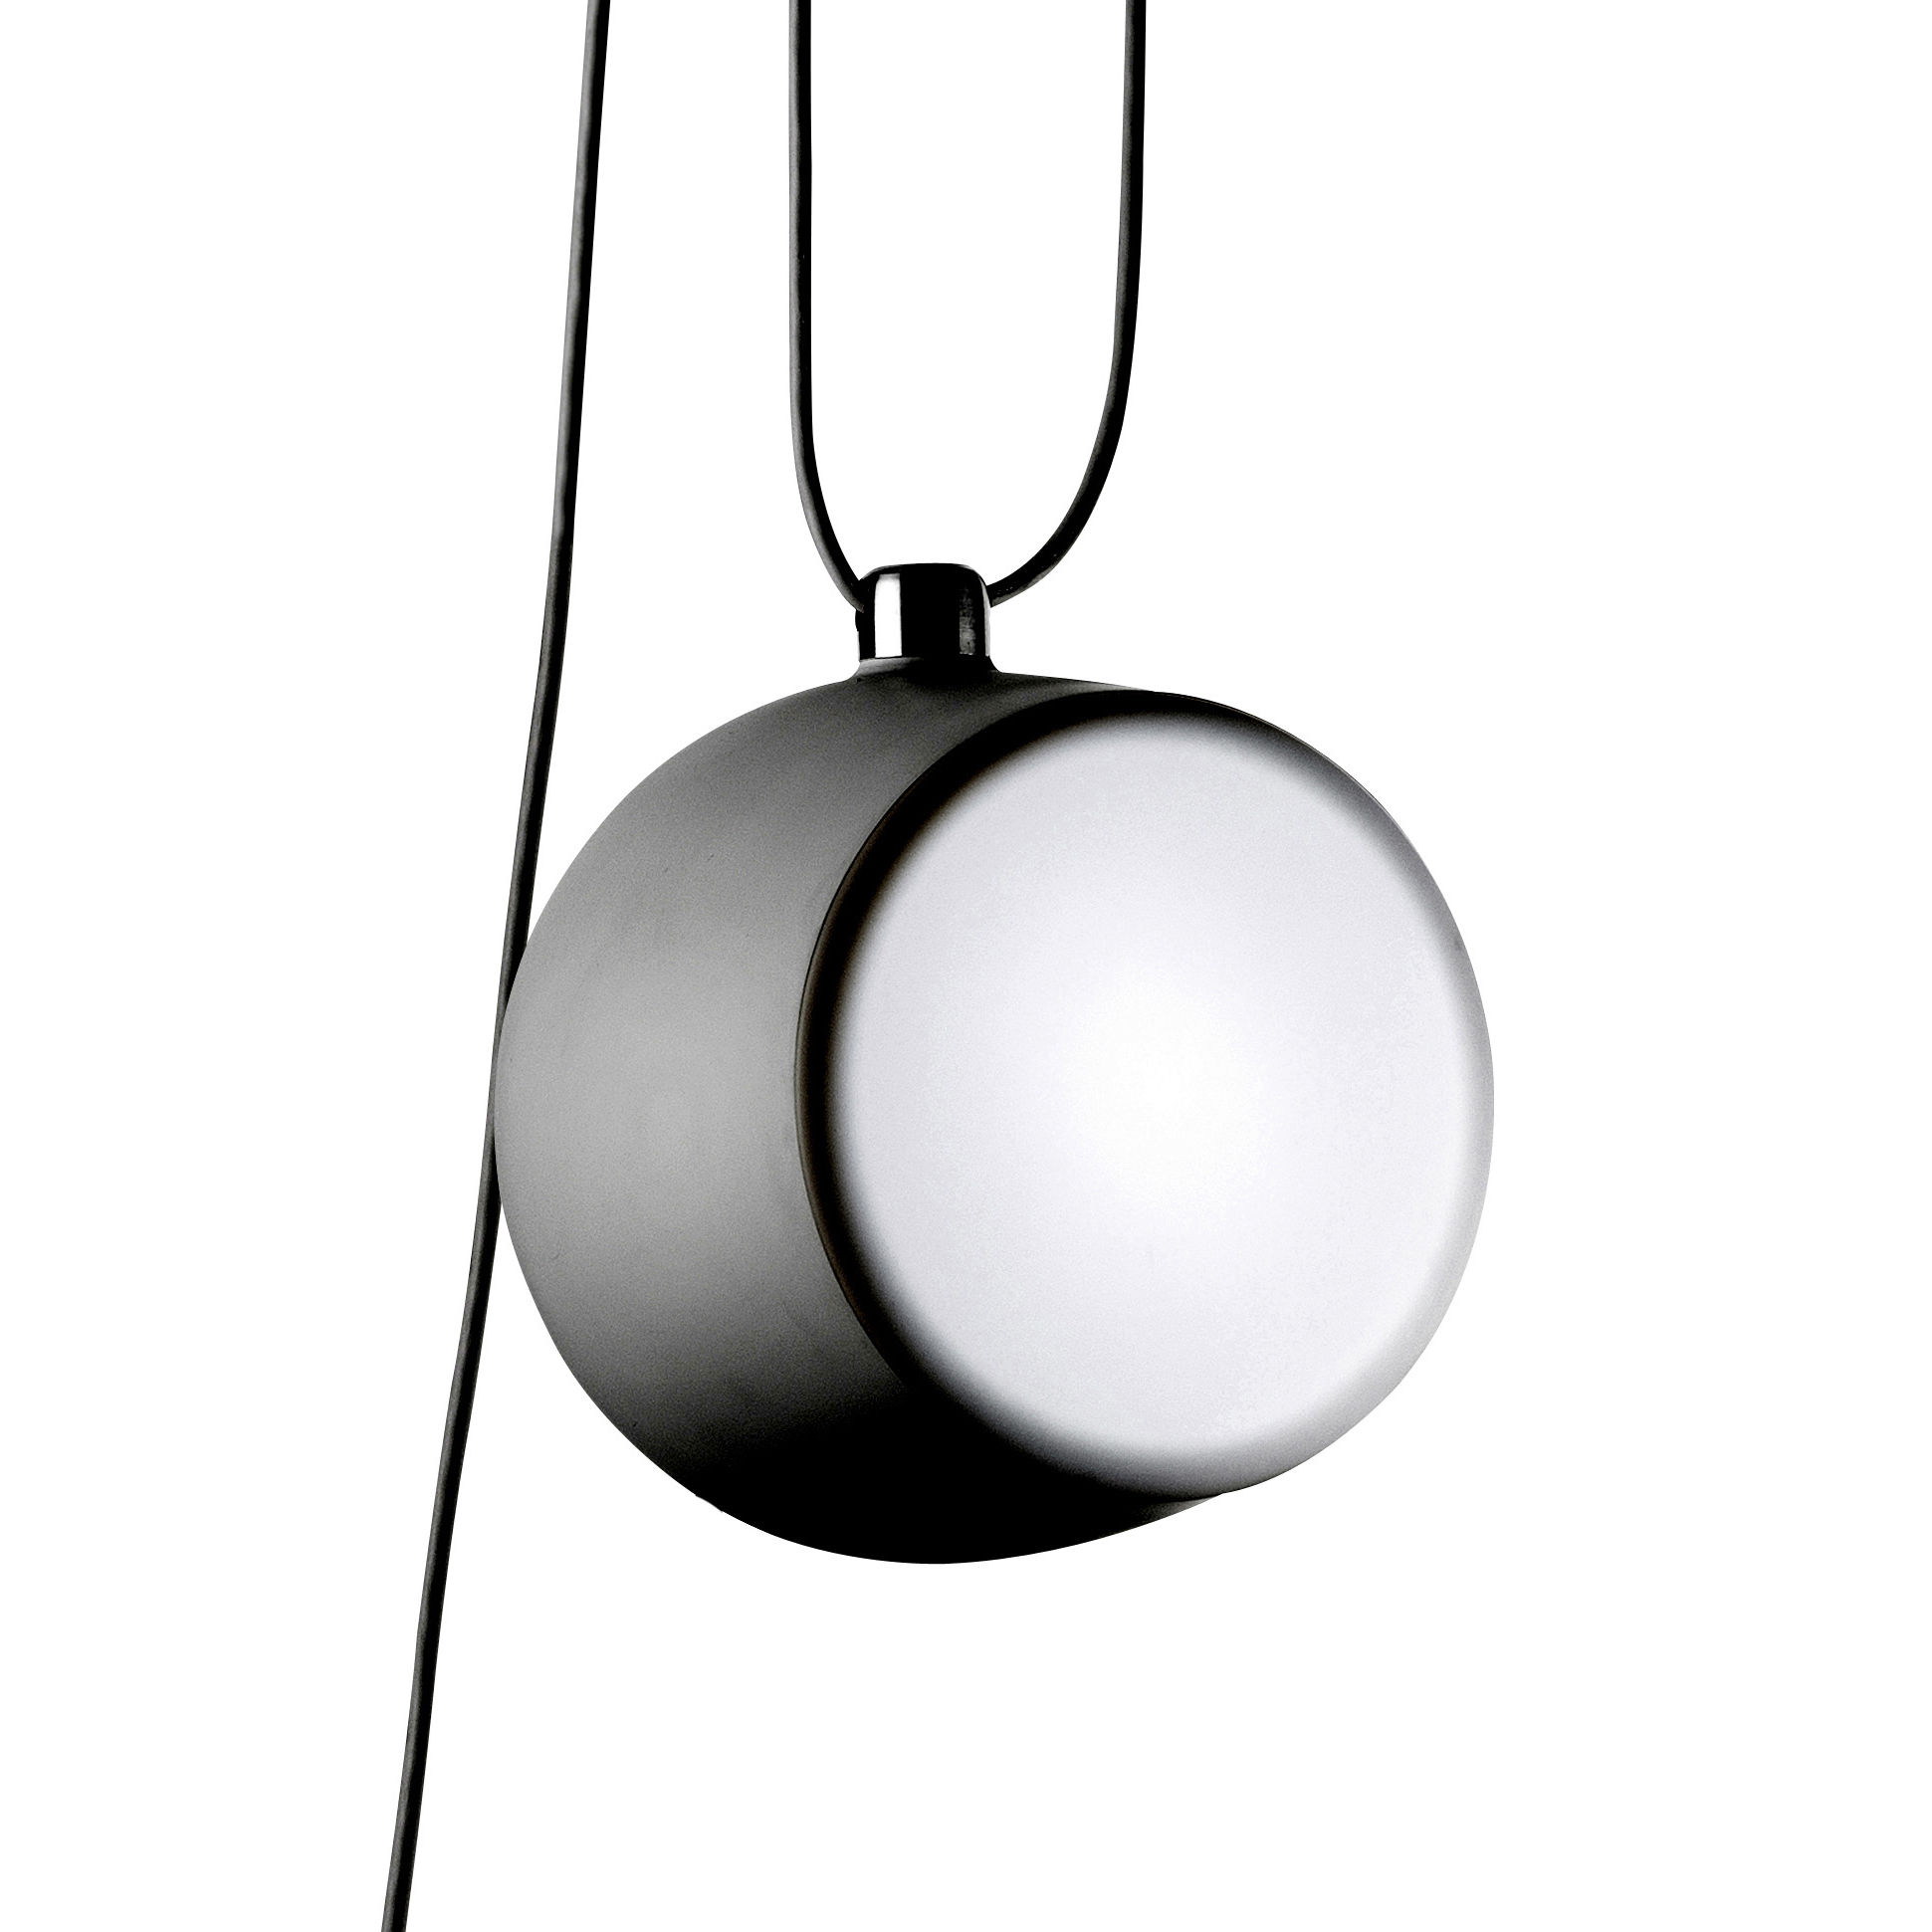 Lighting - Pendant Lighting - AIM Pendant - LED - Ø 24 cm by Flos - black - Painted aluminium, Polycarbonate